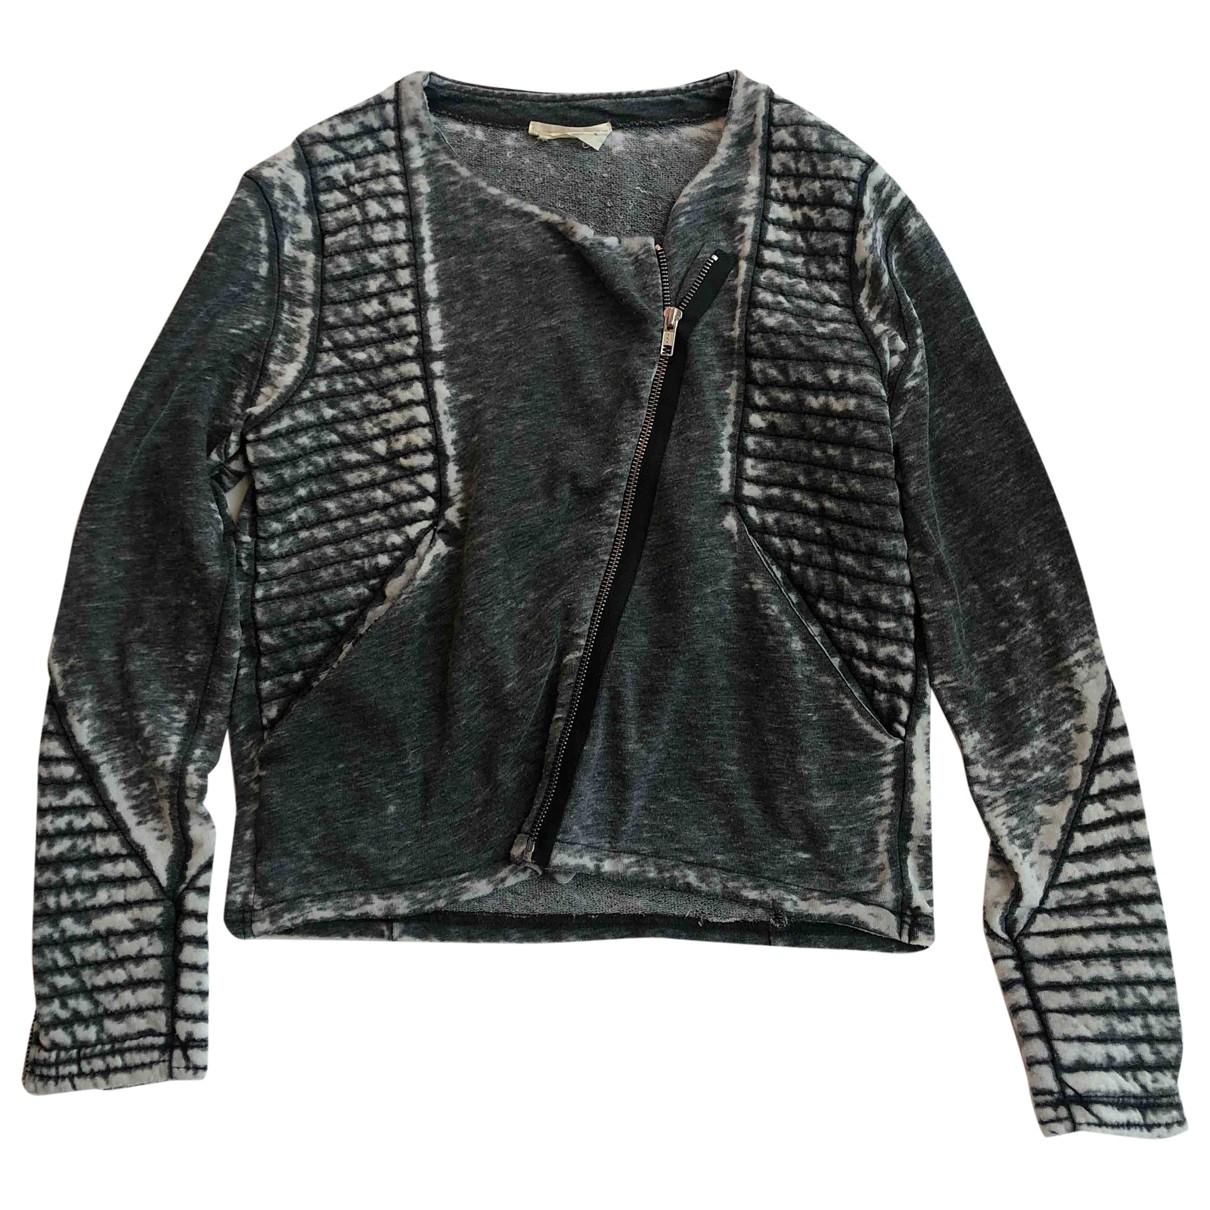 American Vintage \N Grey Cotton jacket for Women S International